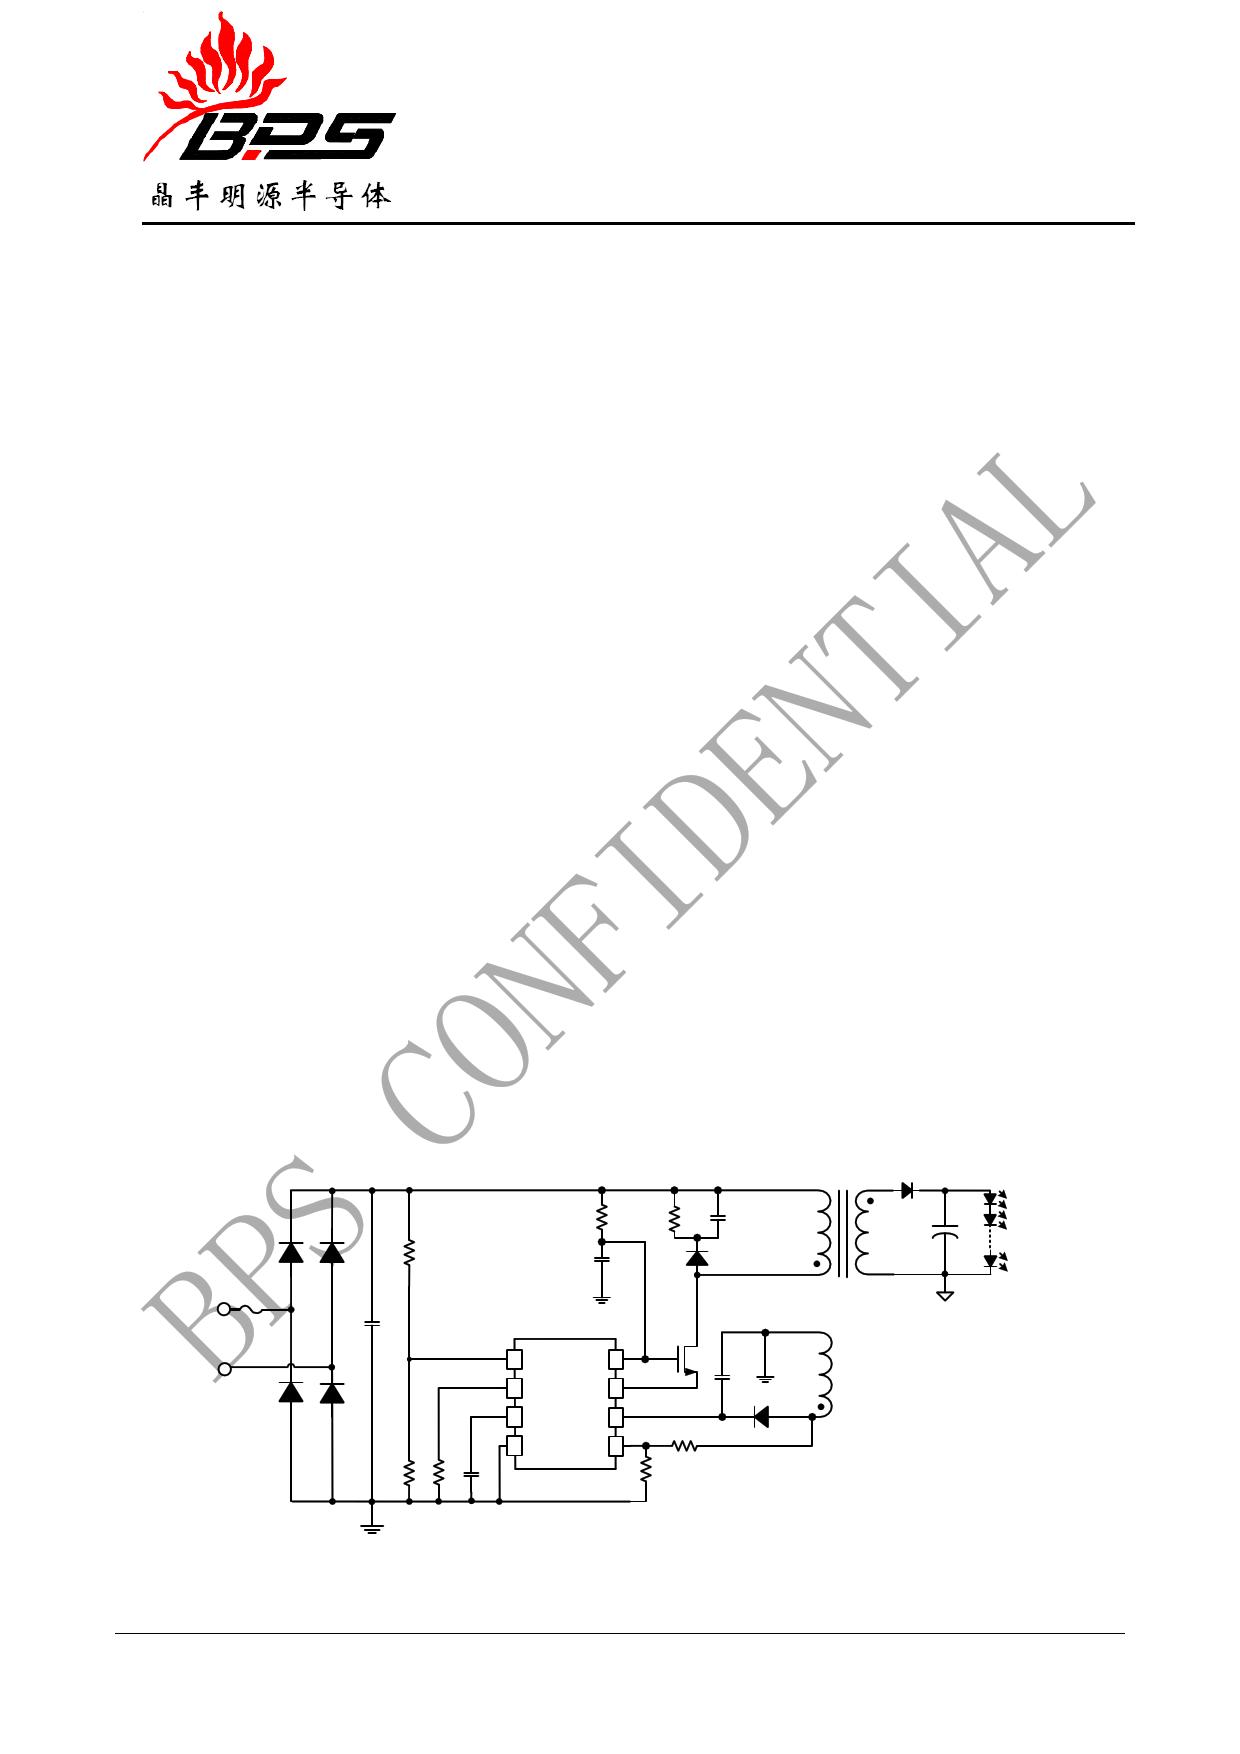 Bp3309 Led Driver Wiring Diagram Controller